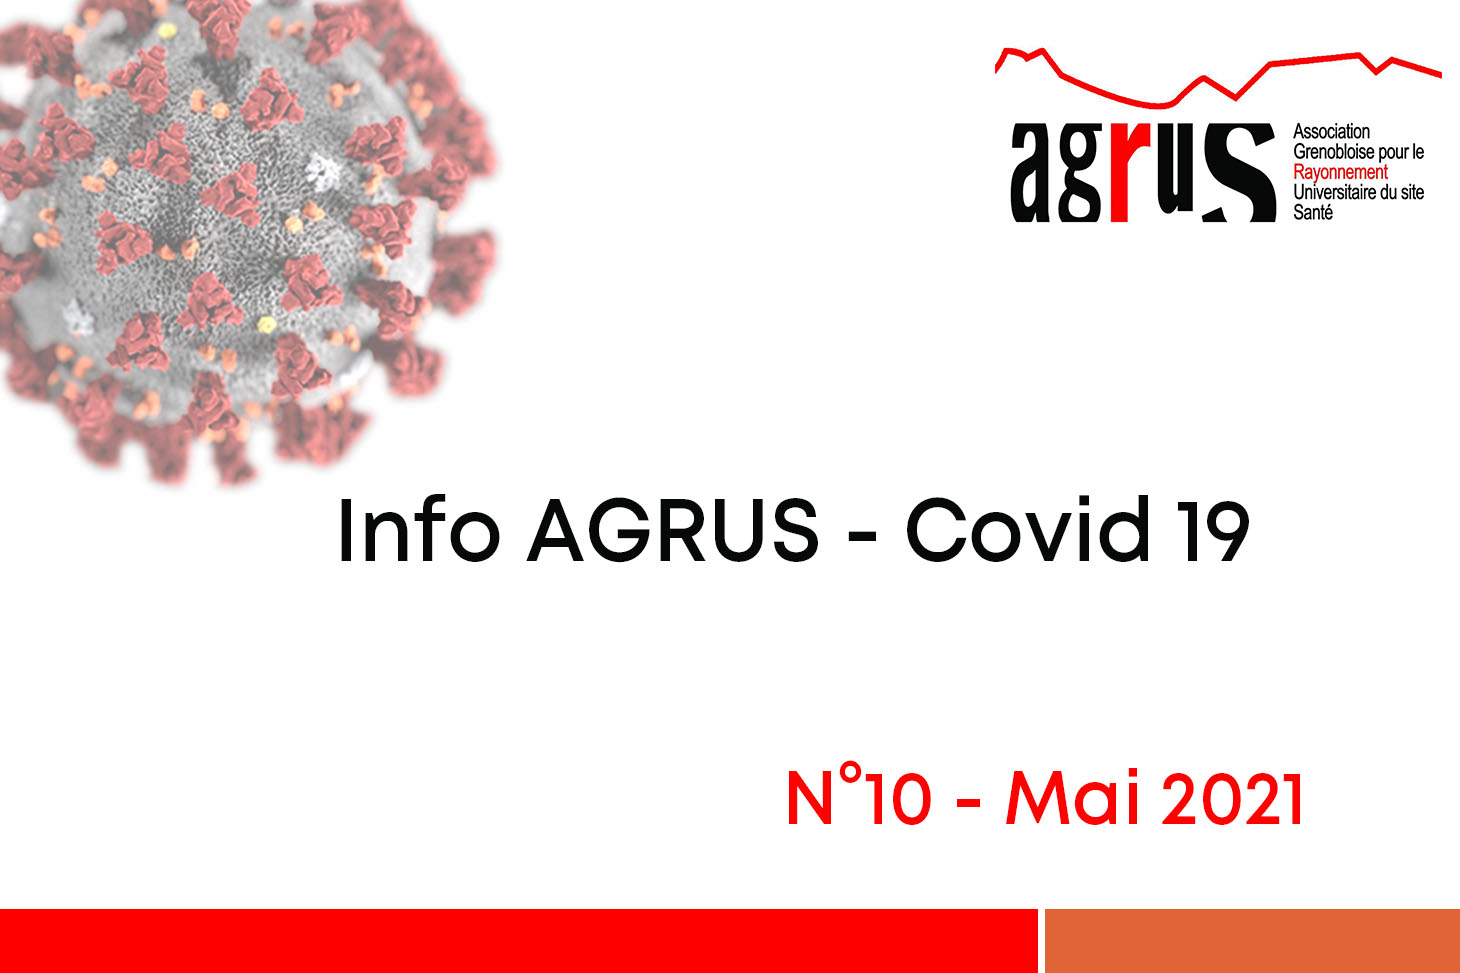 Info covid 19 - AGRUS